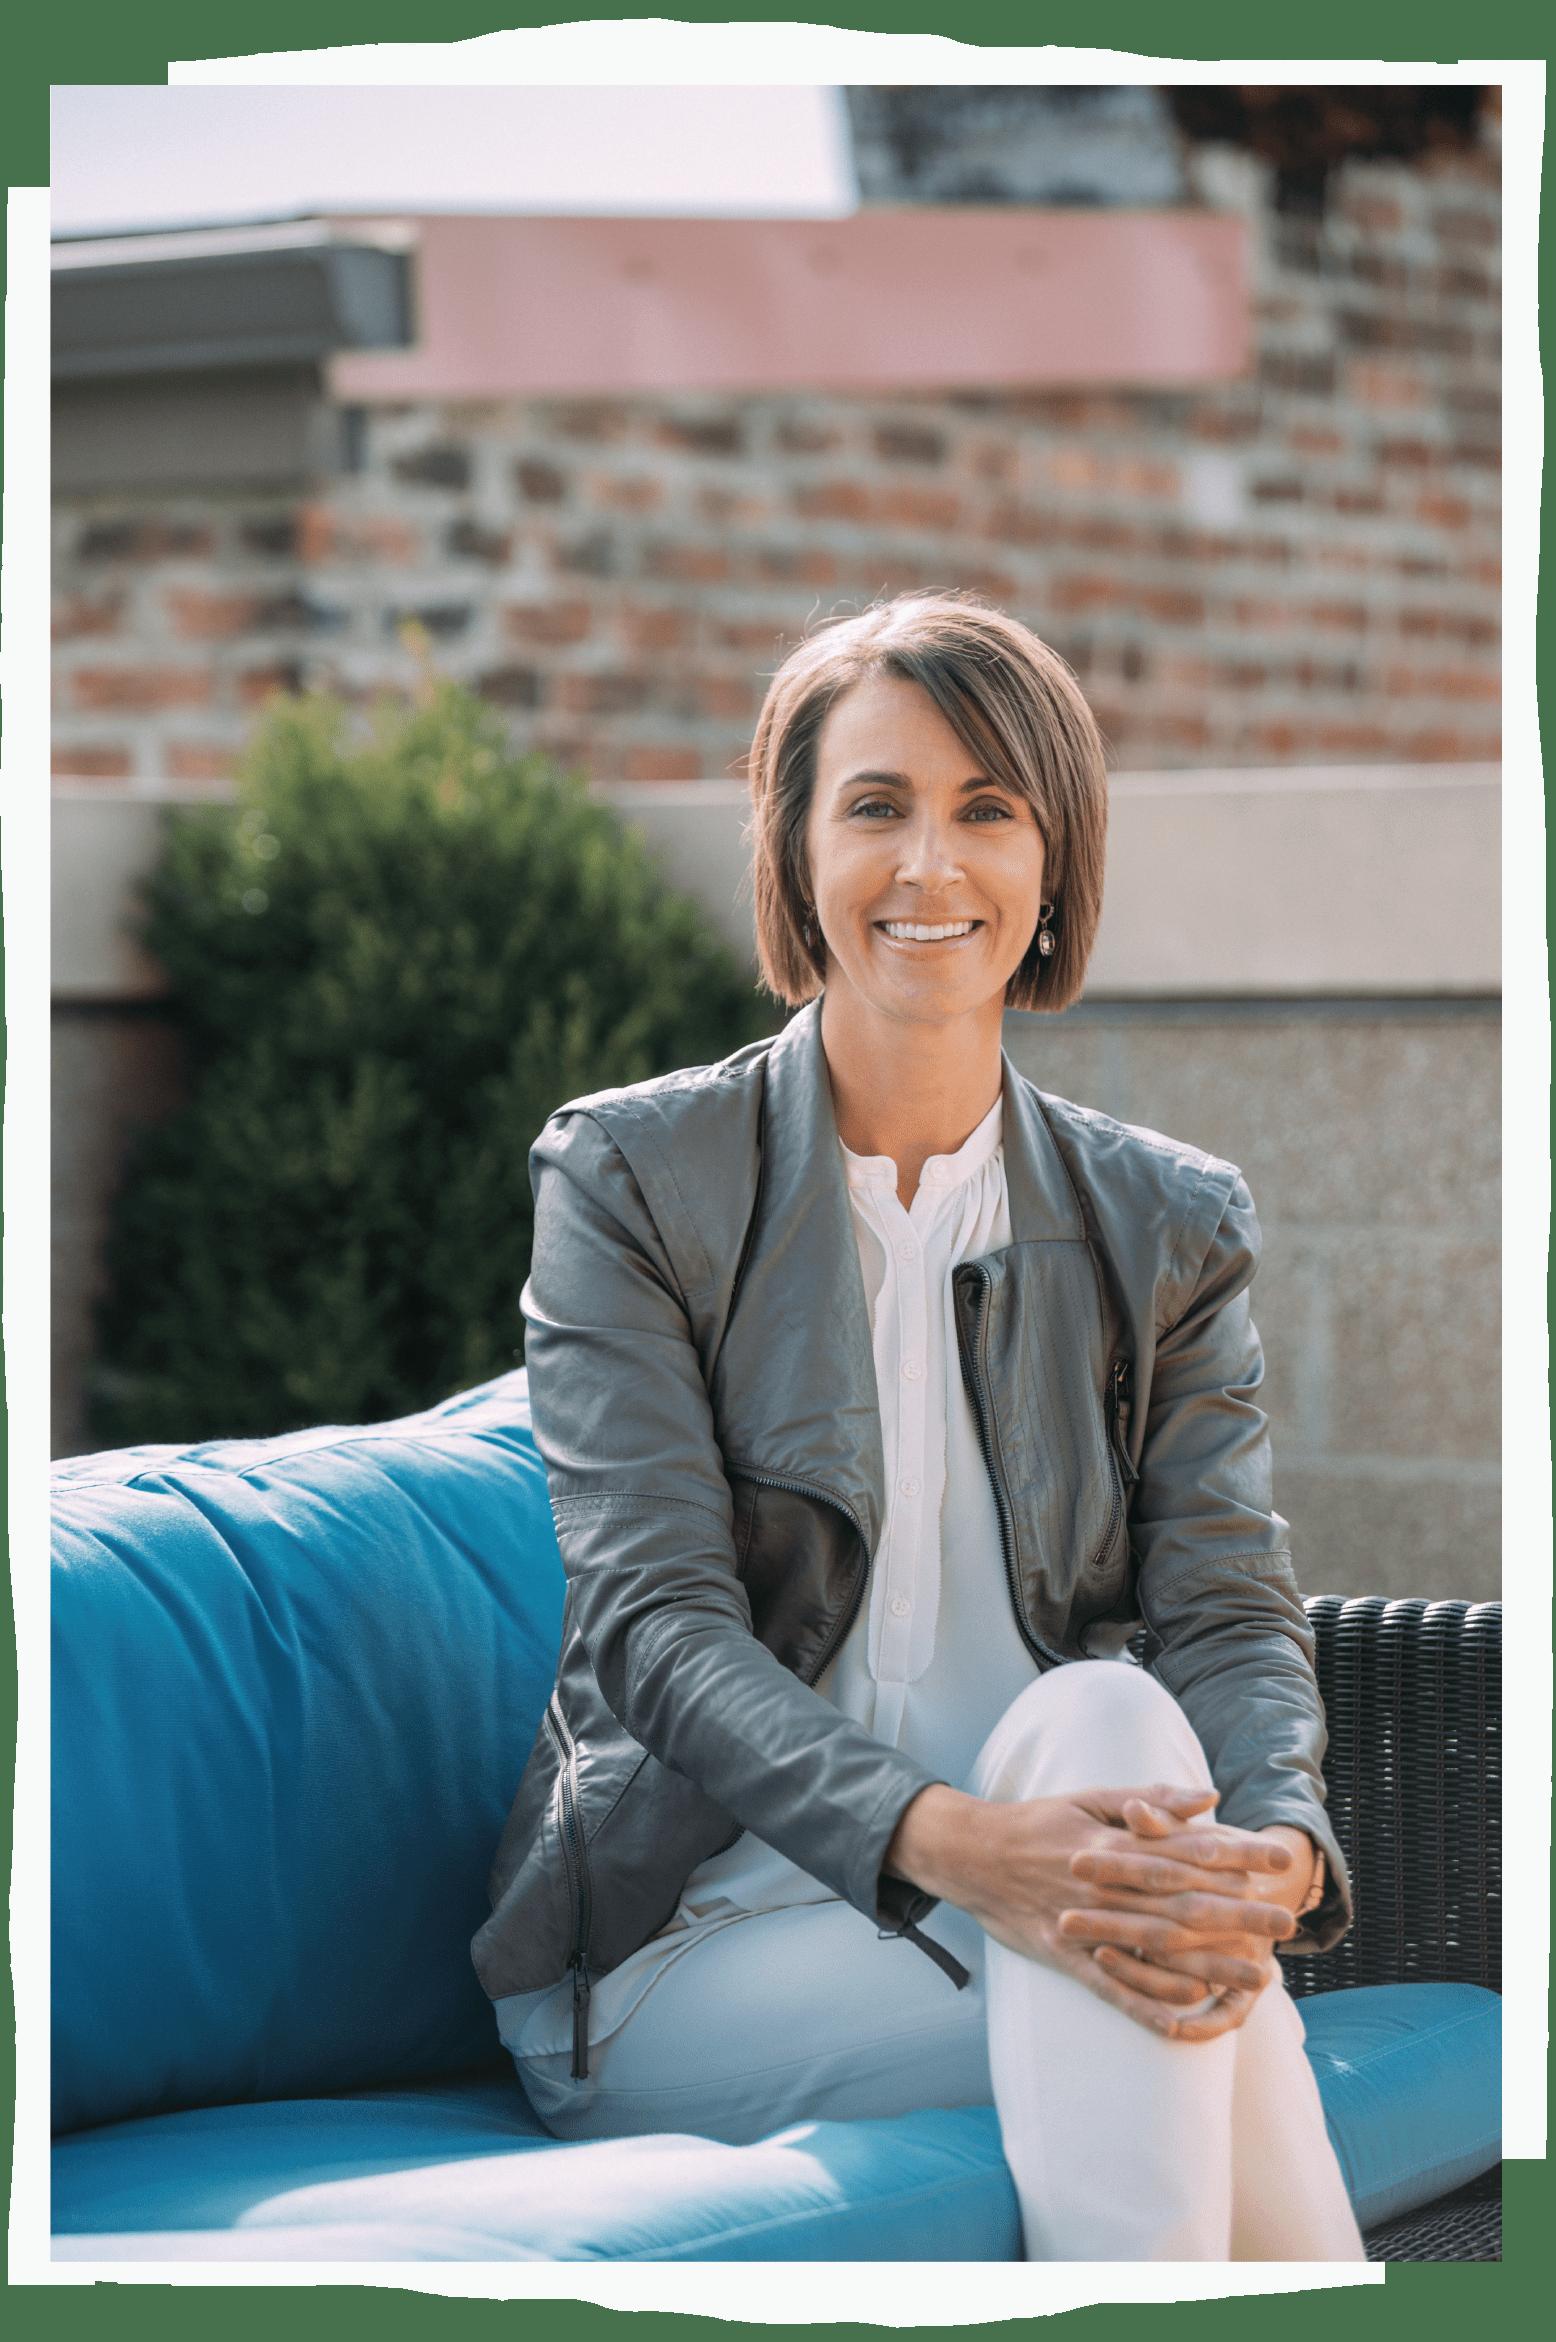 Amanda Hill, President of Female Forward